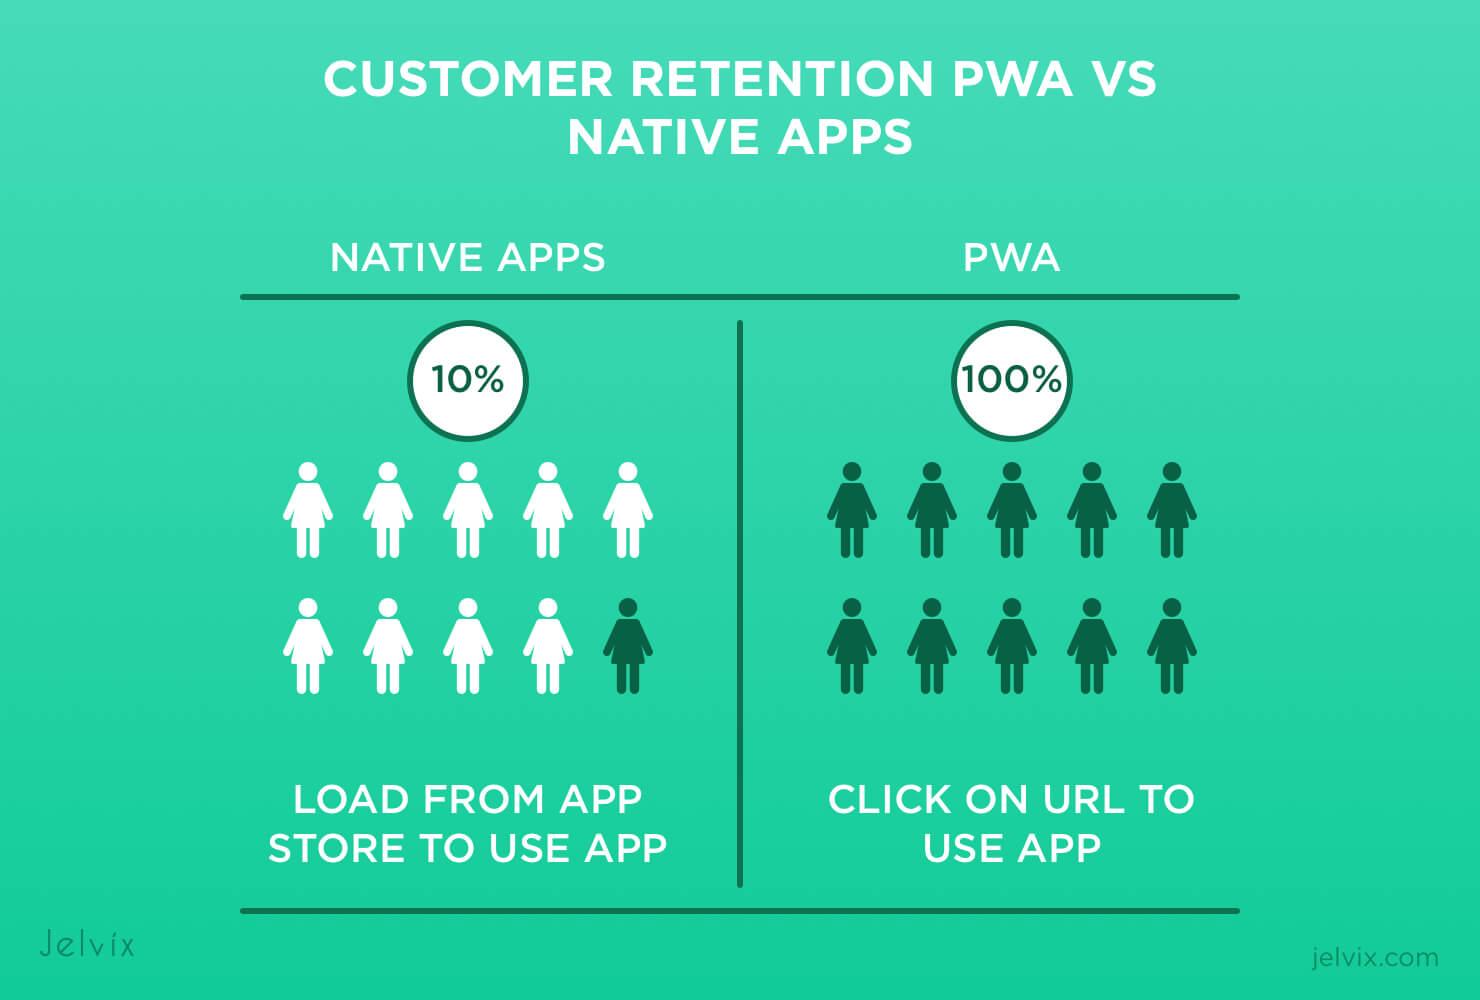 PWA vs native app retention rate